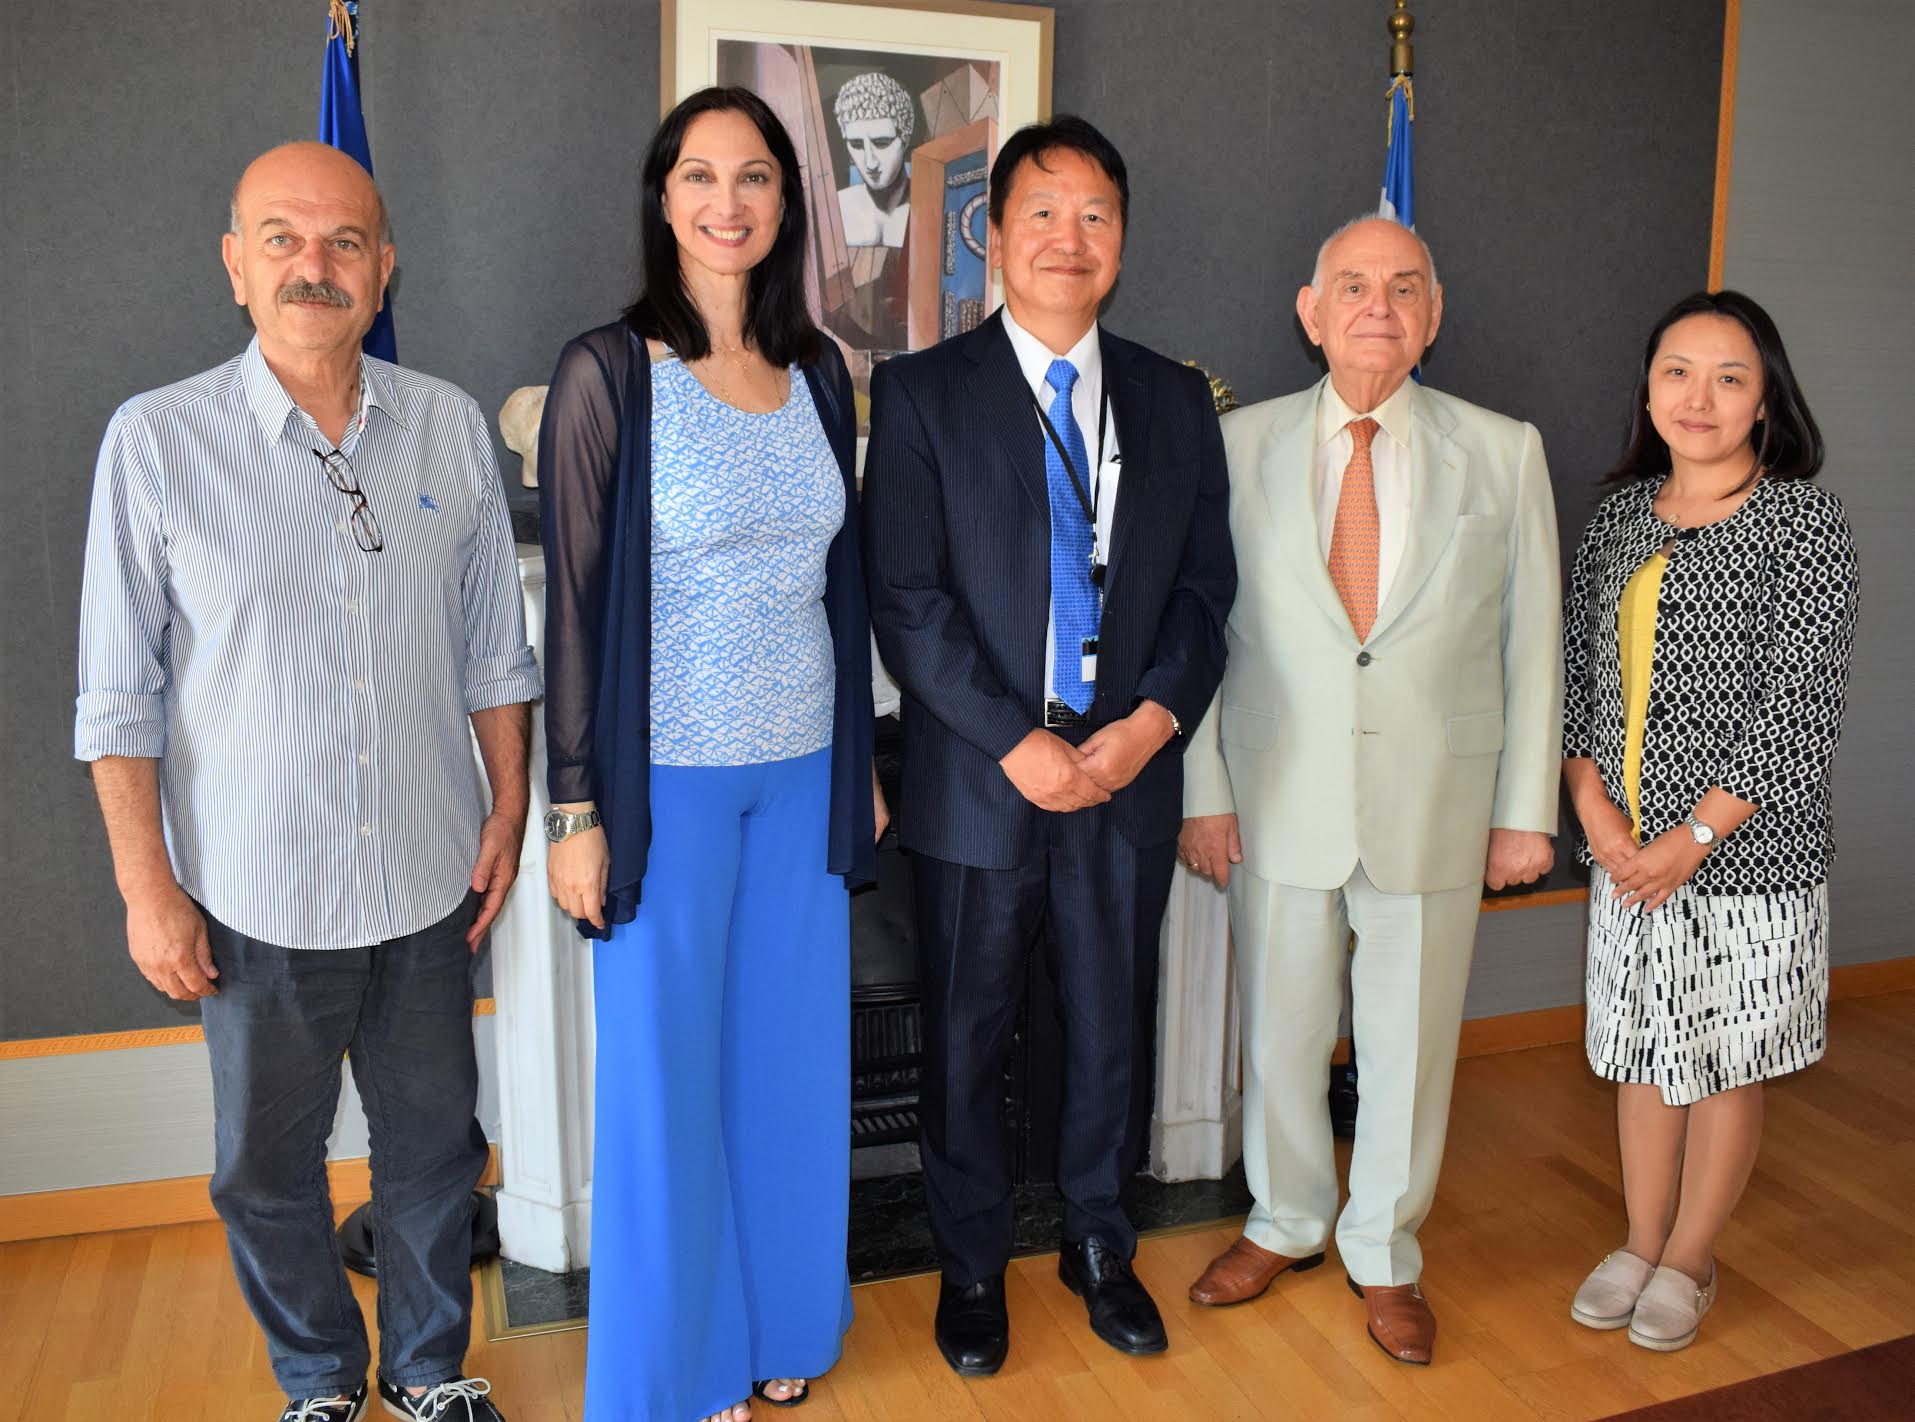 Athens to host 'Japan Week' international festival in November 2019